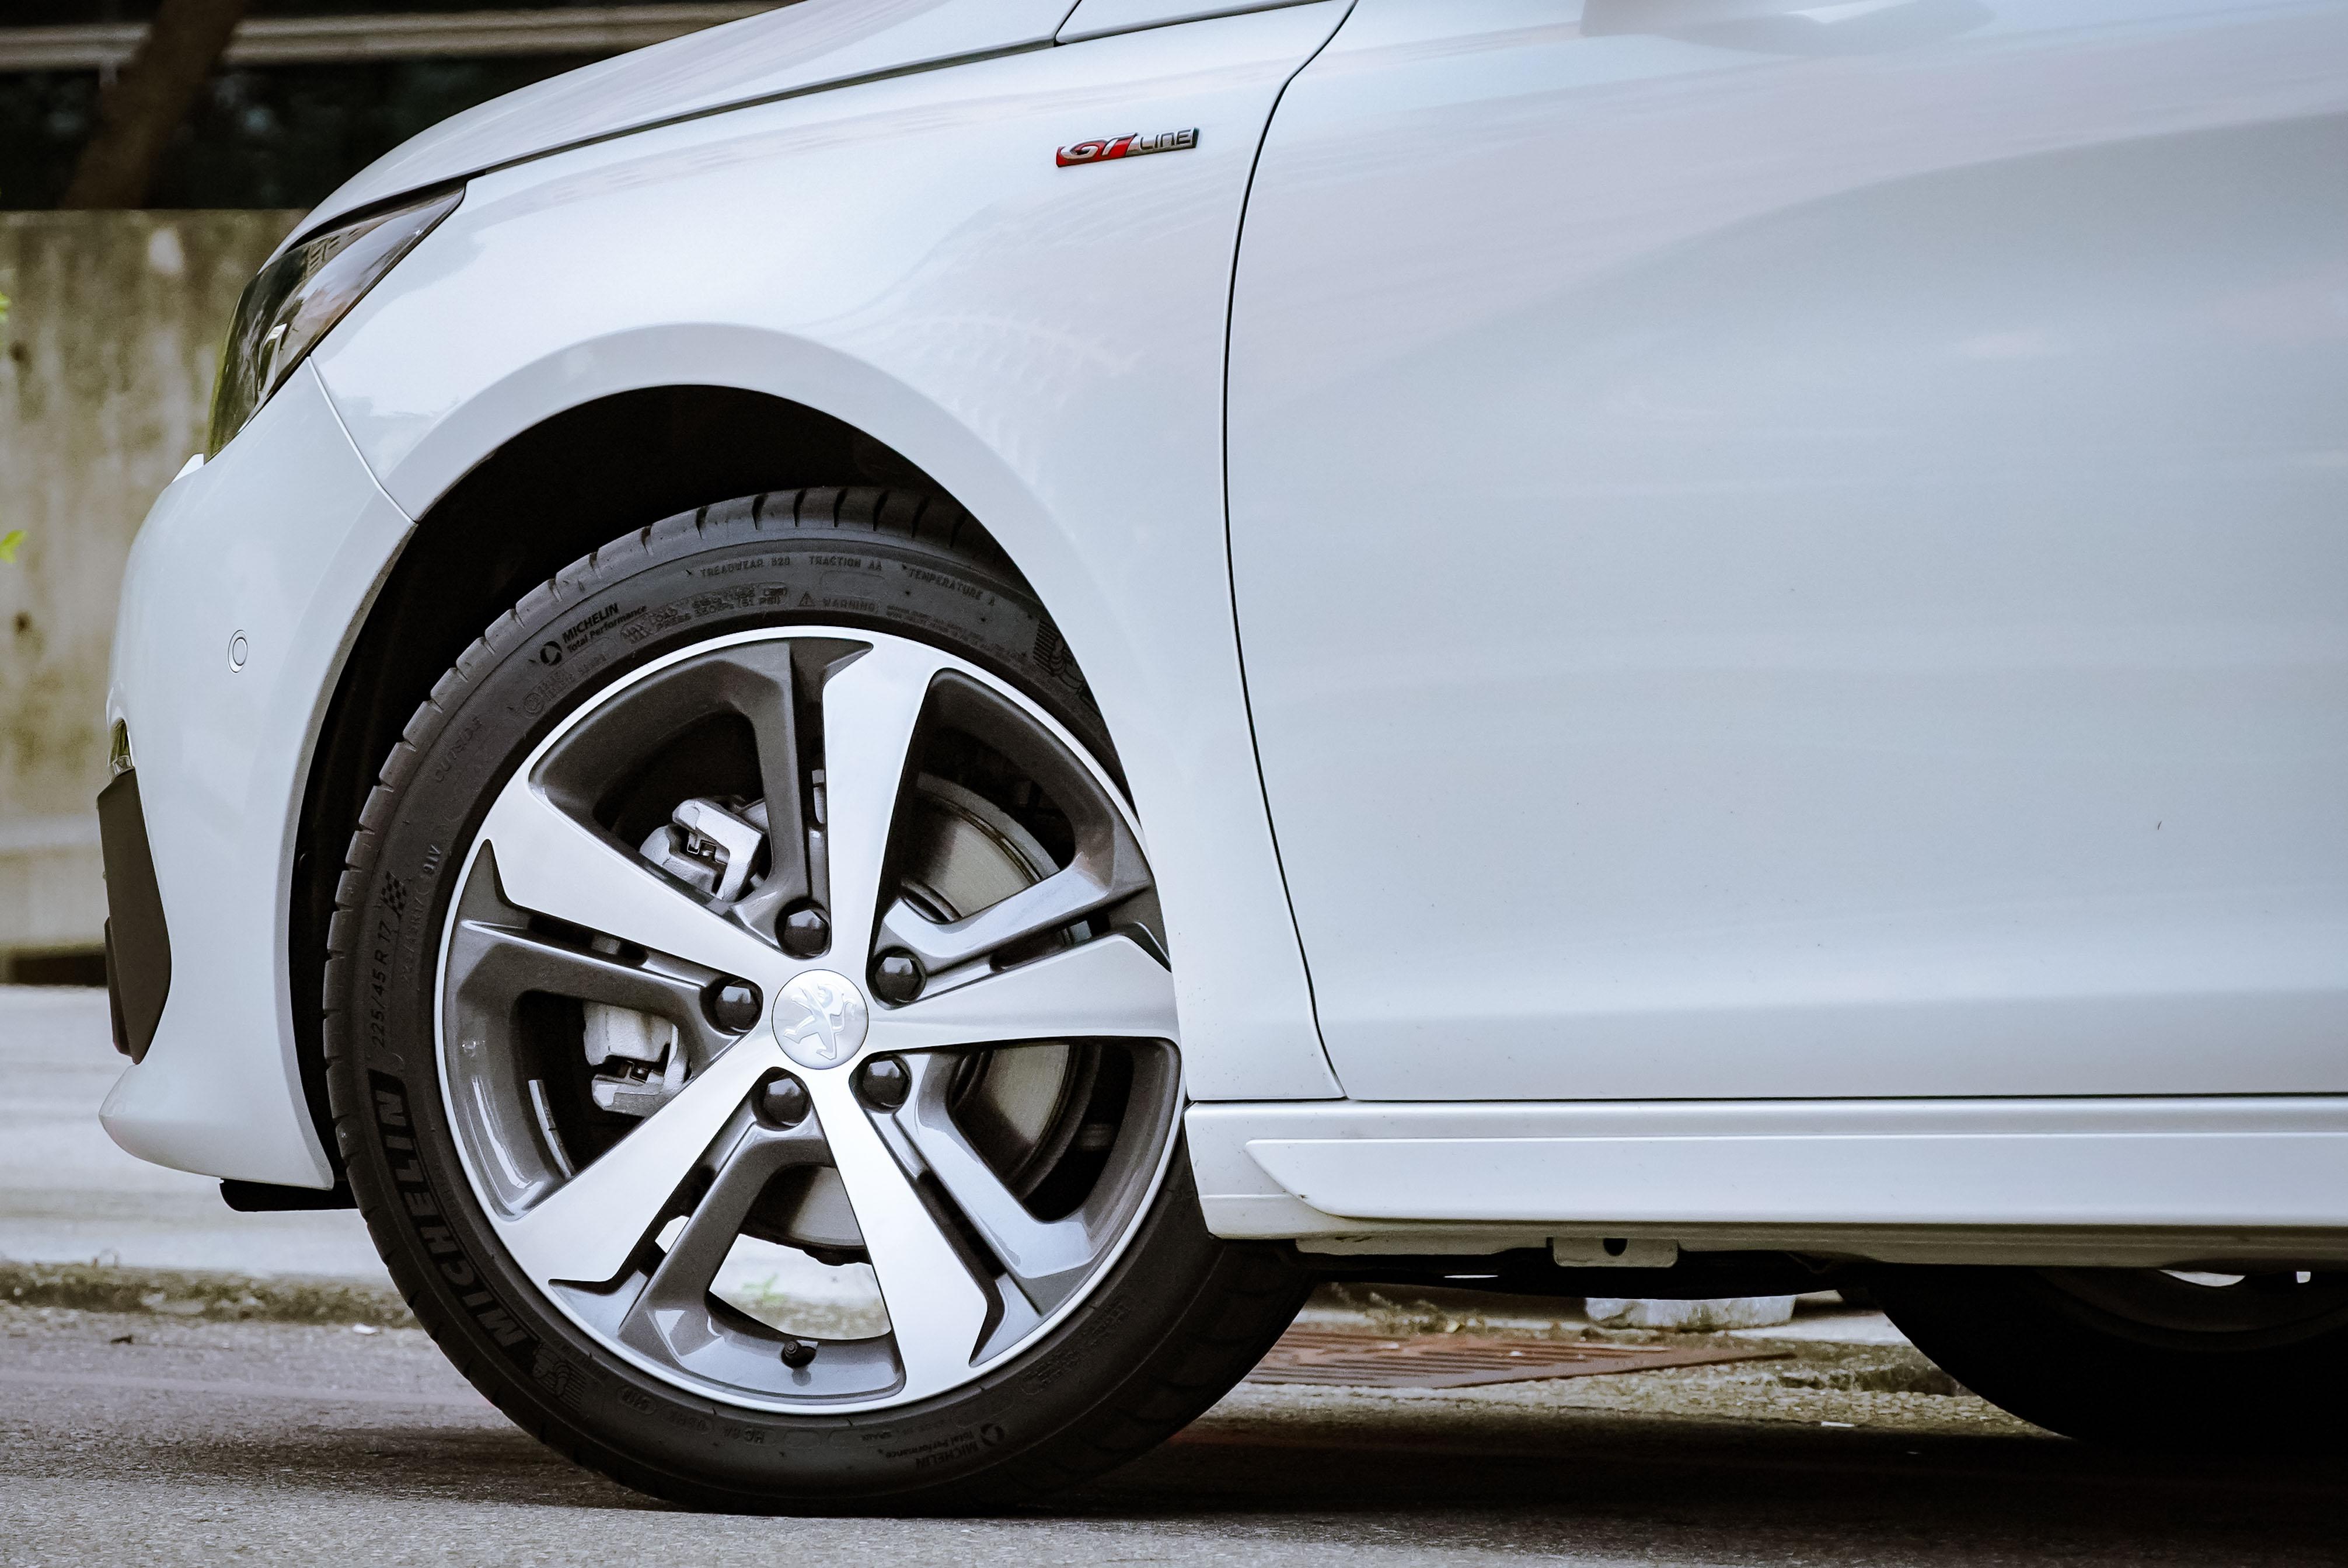 GT Line Cielo 標配 17 吋輕量化鋁合金輪圈。